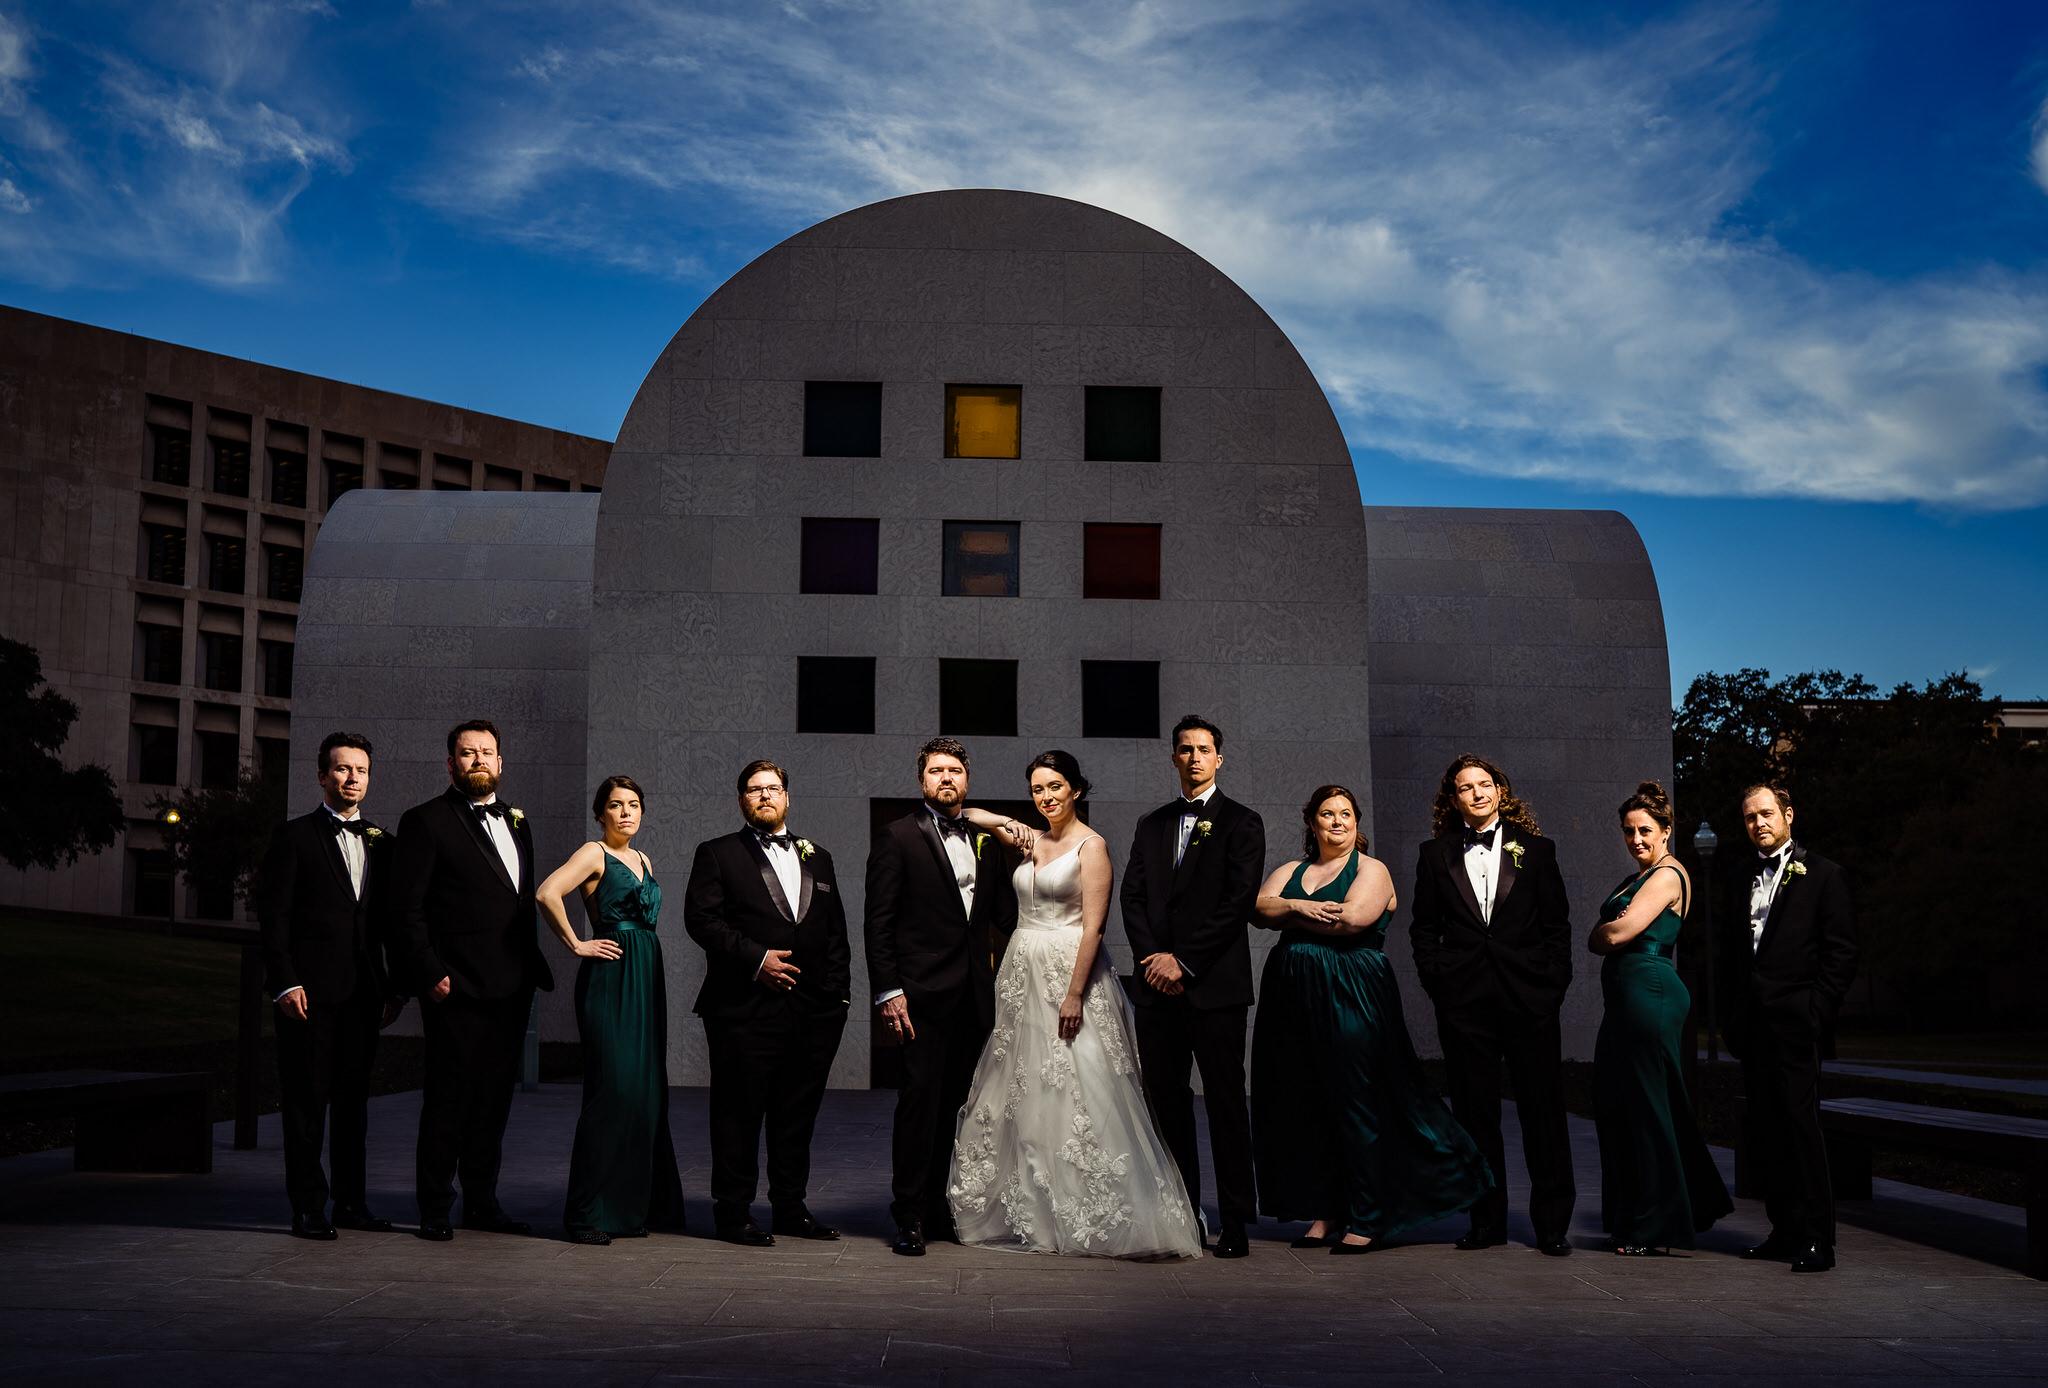 best austin wedding photographer john winters photography number 1 top rated downtown austin wedding blanton museum of art